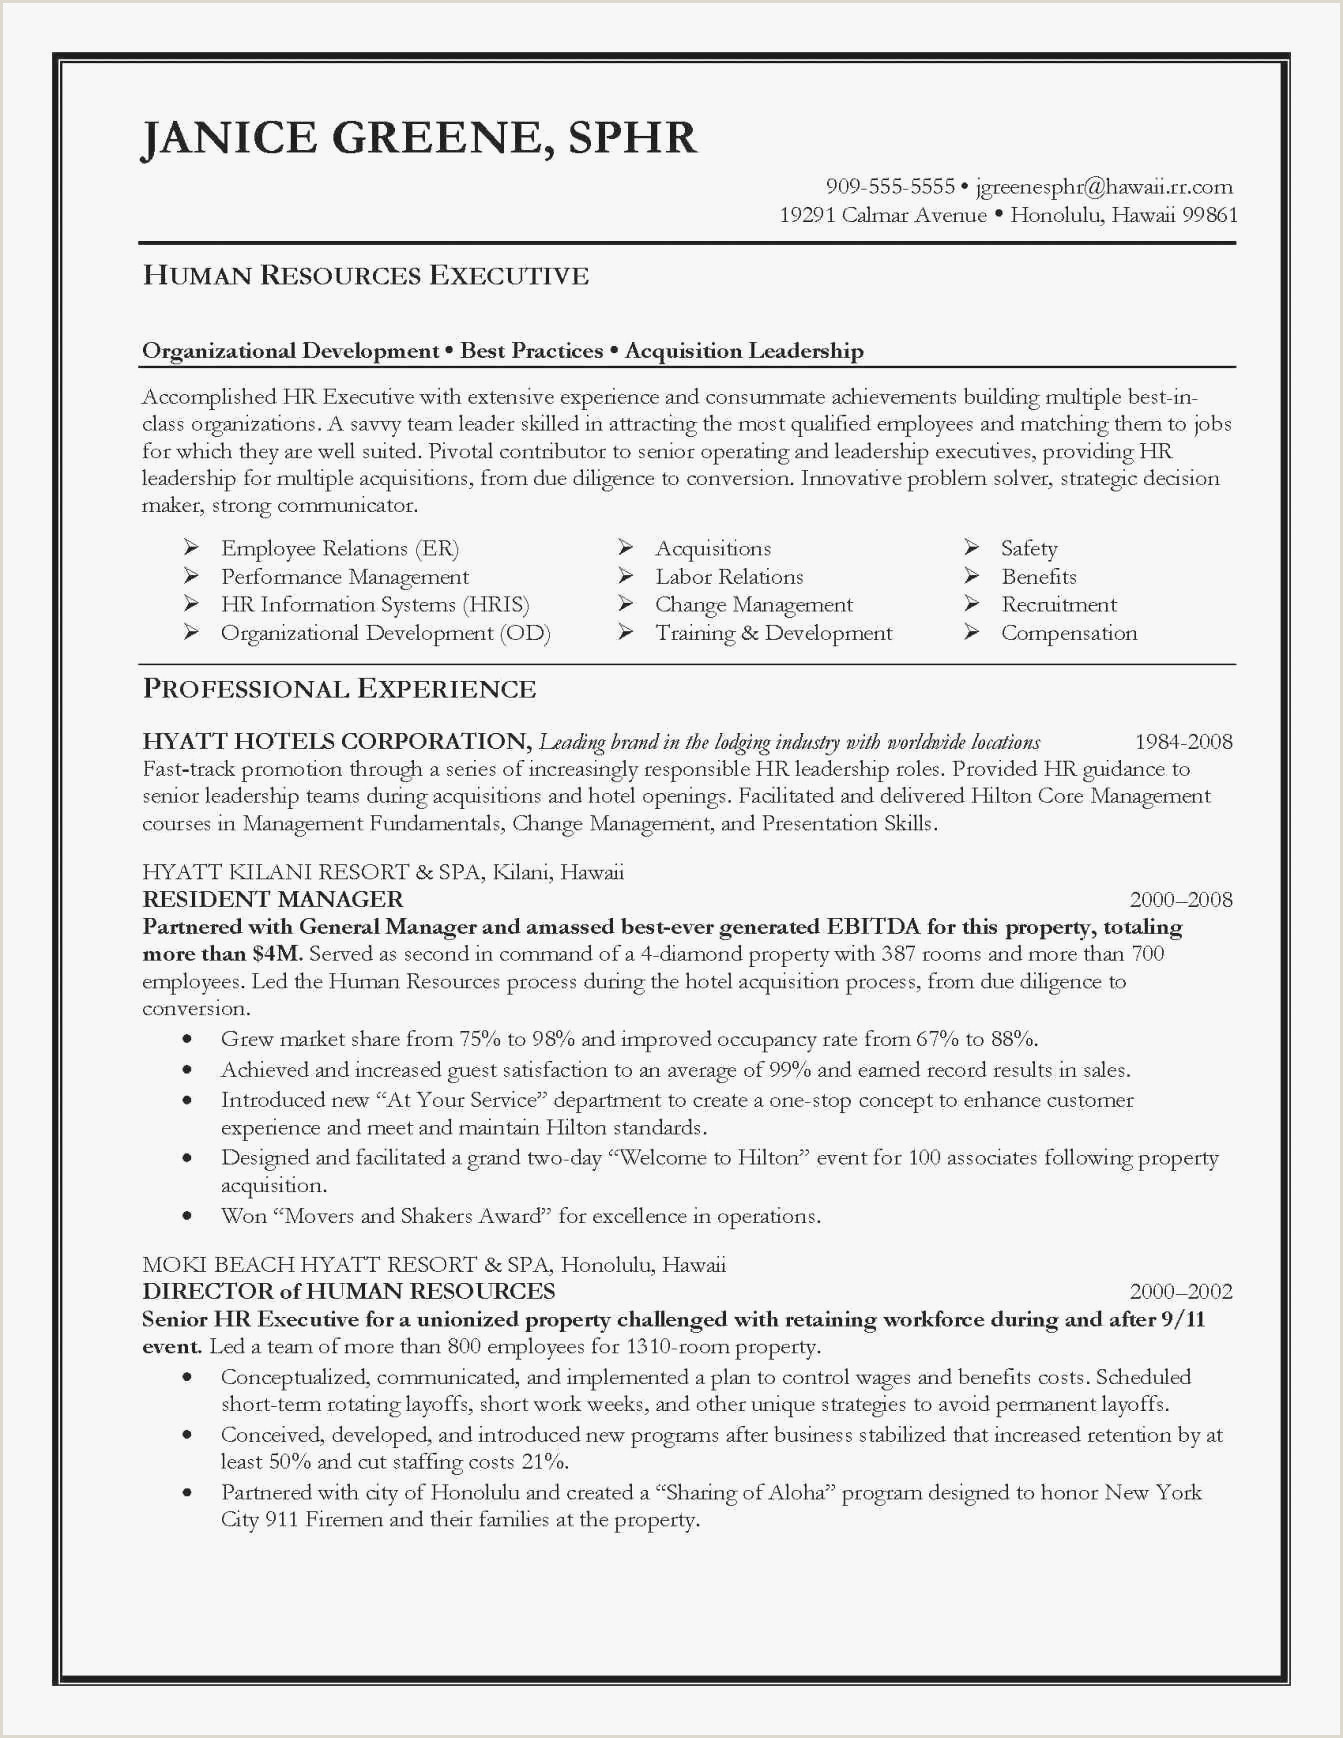 Career Builder Resume Sample Professional Summary for Retail Resume